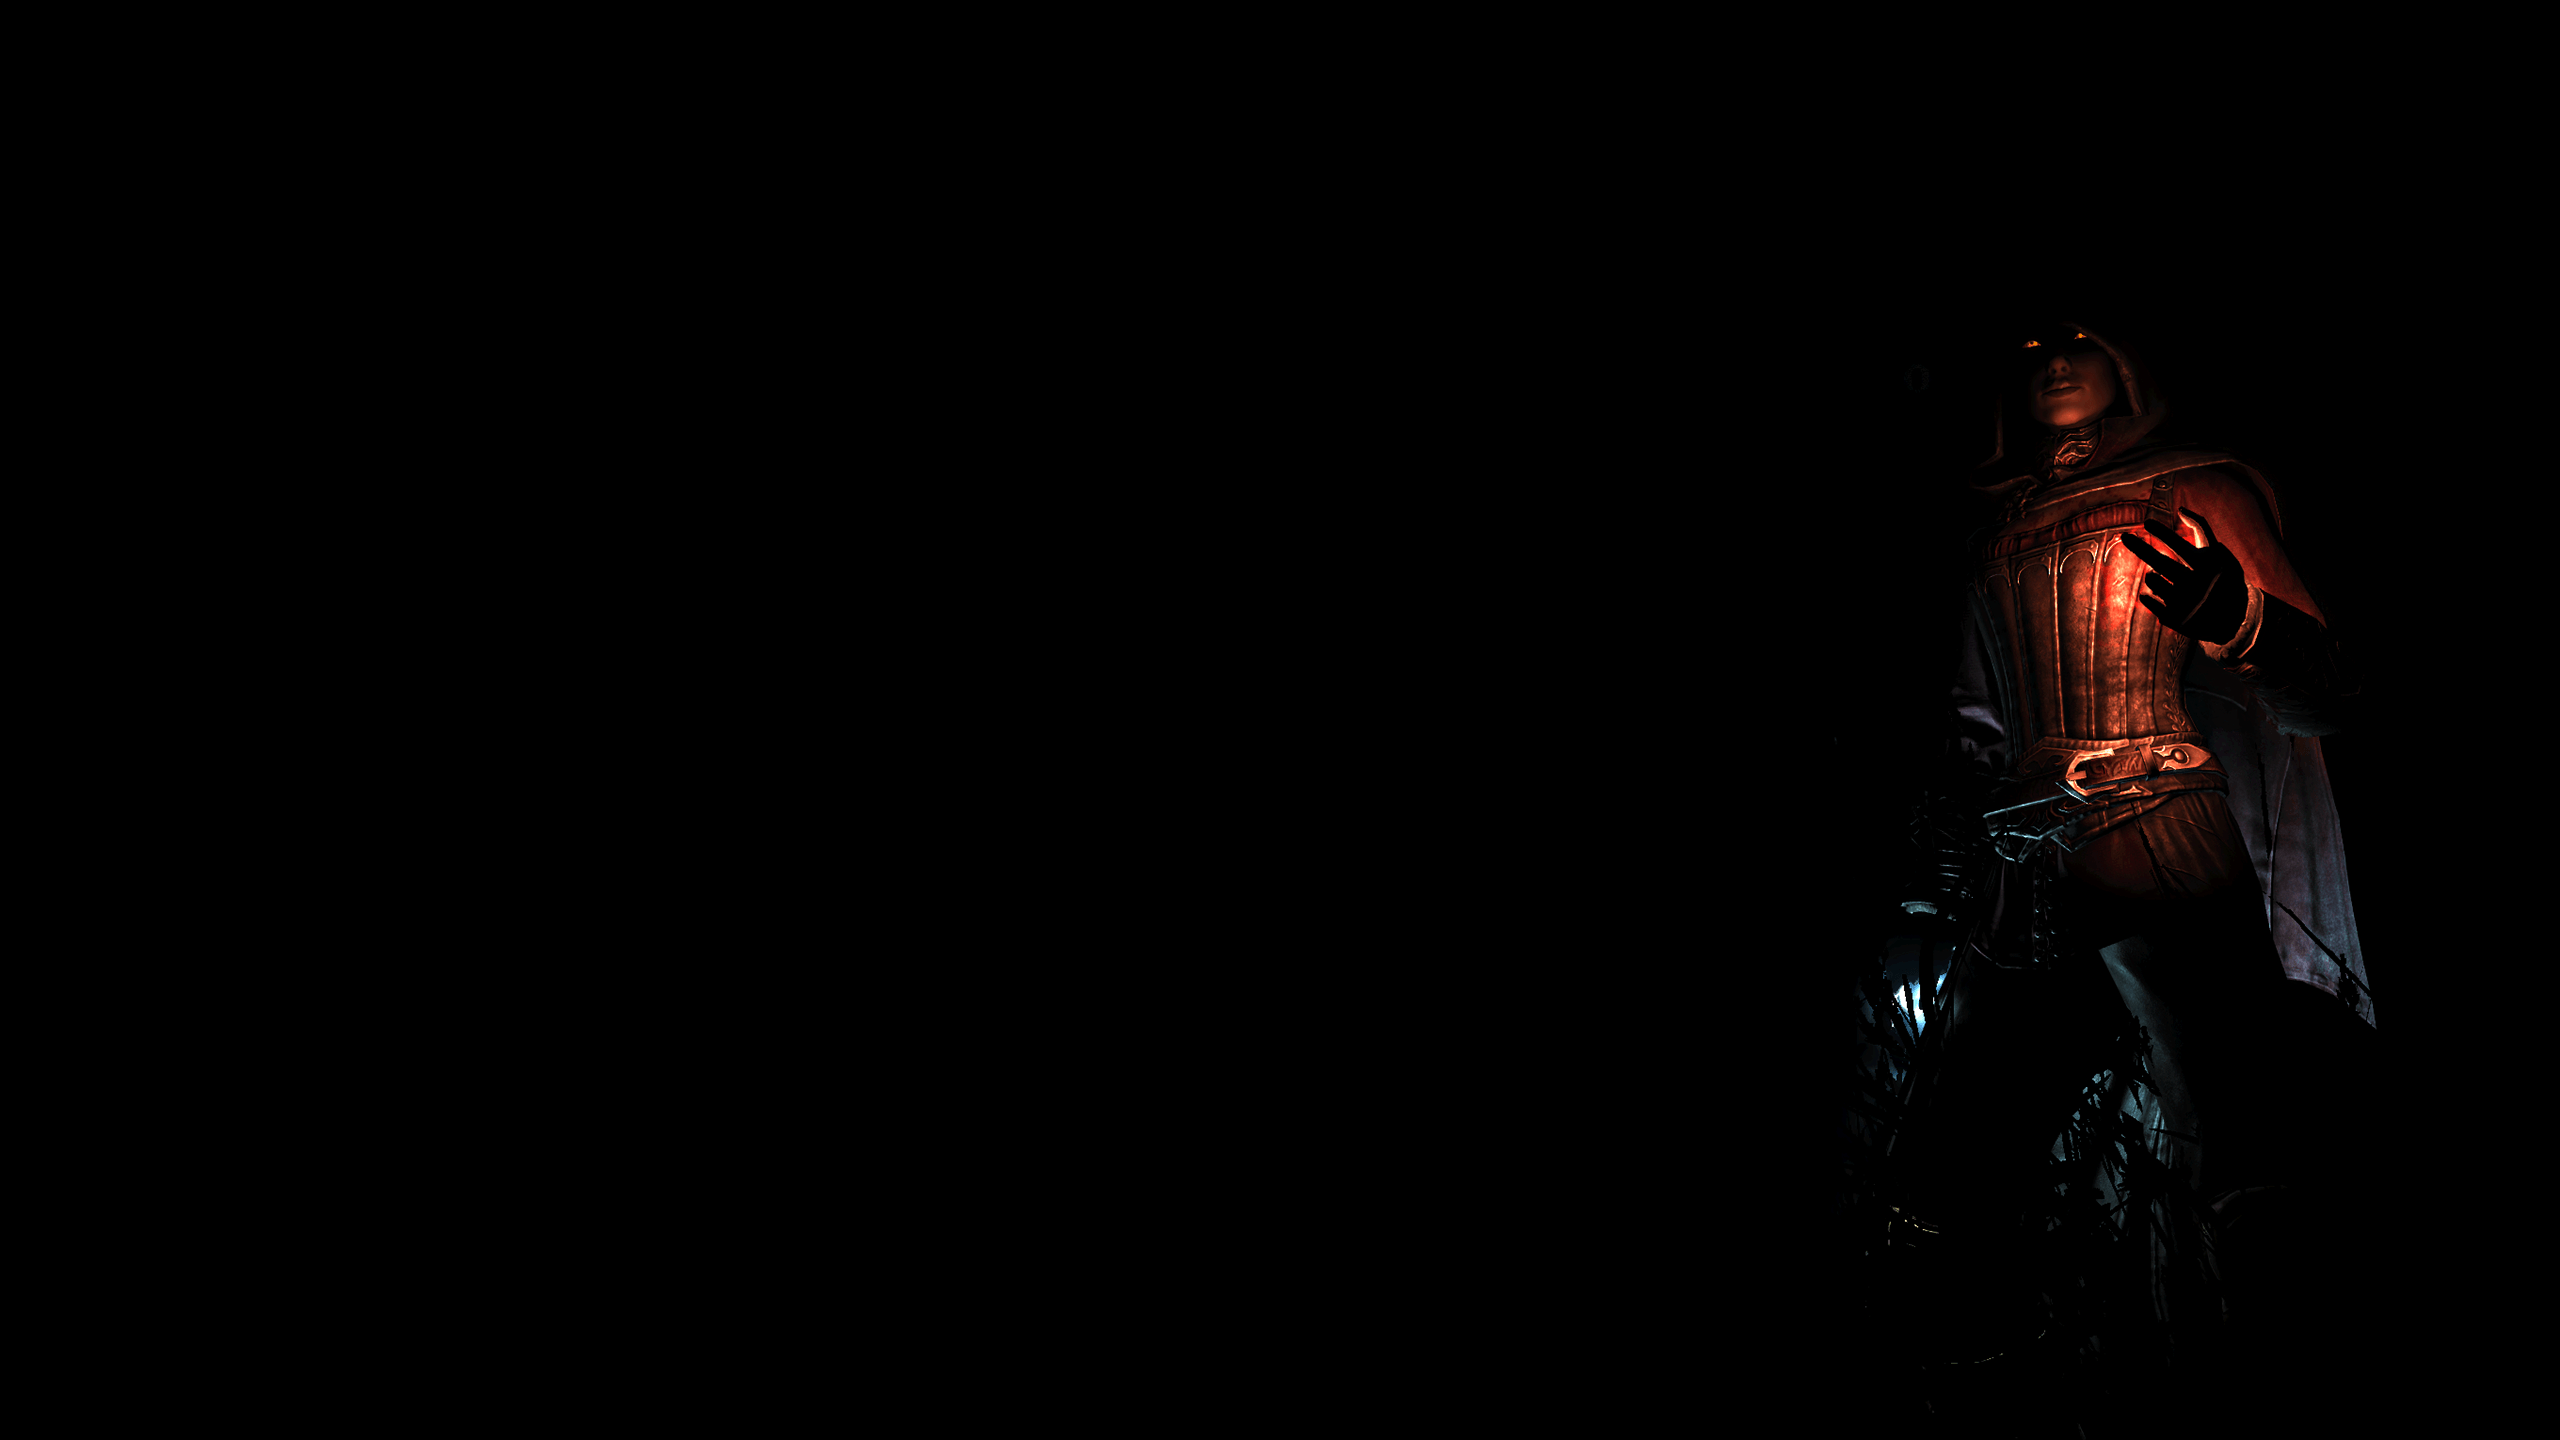 Pubg Black Desktop Wallpapers On Wallpaperdog